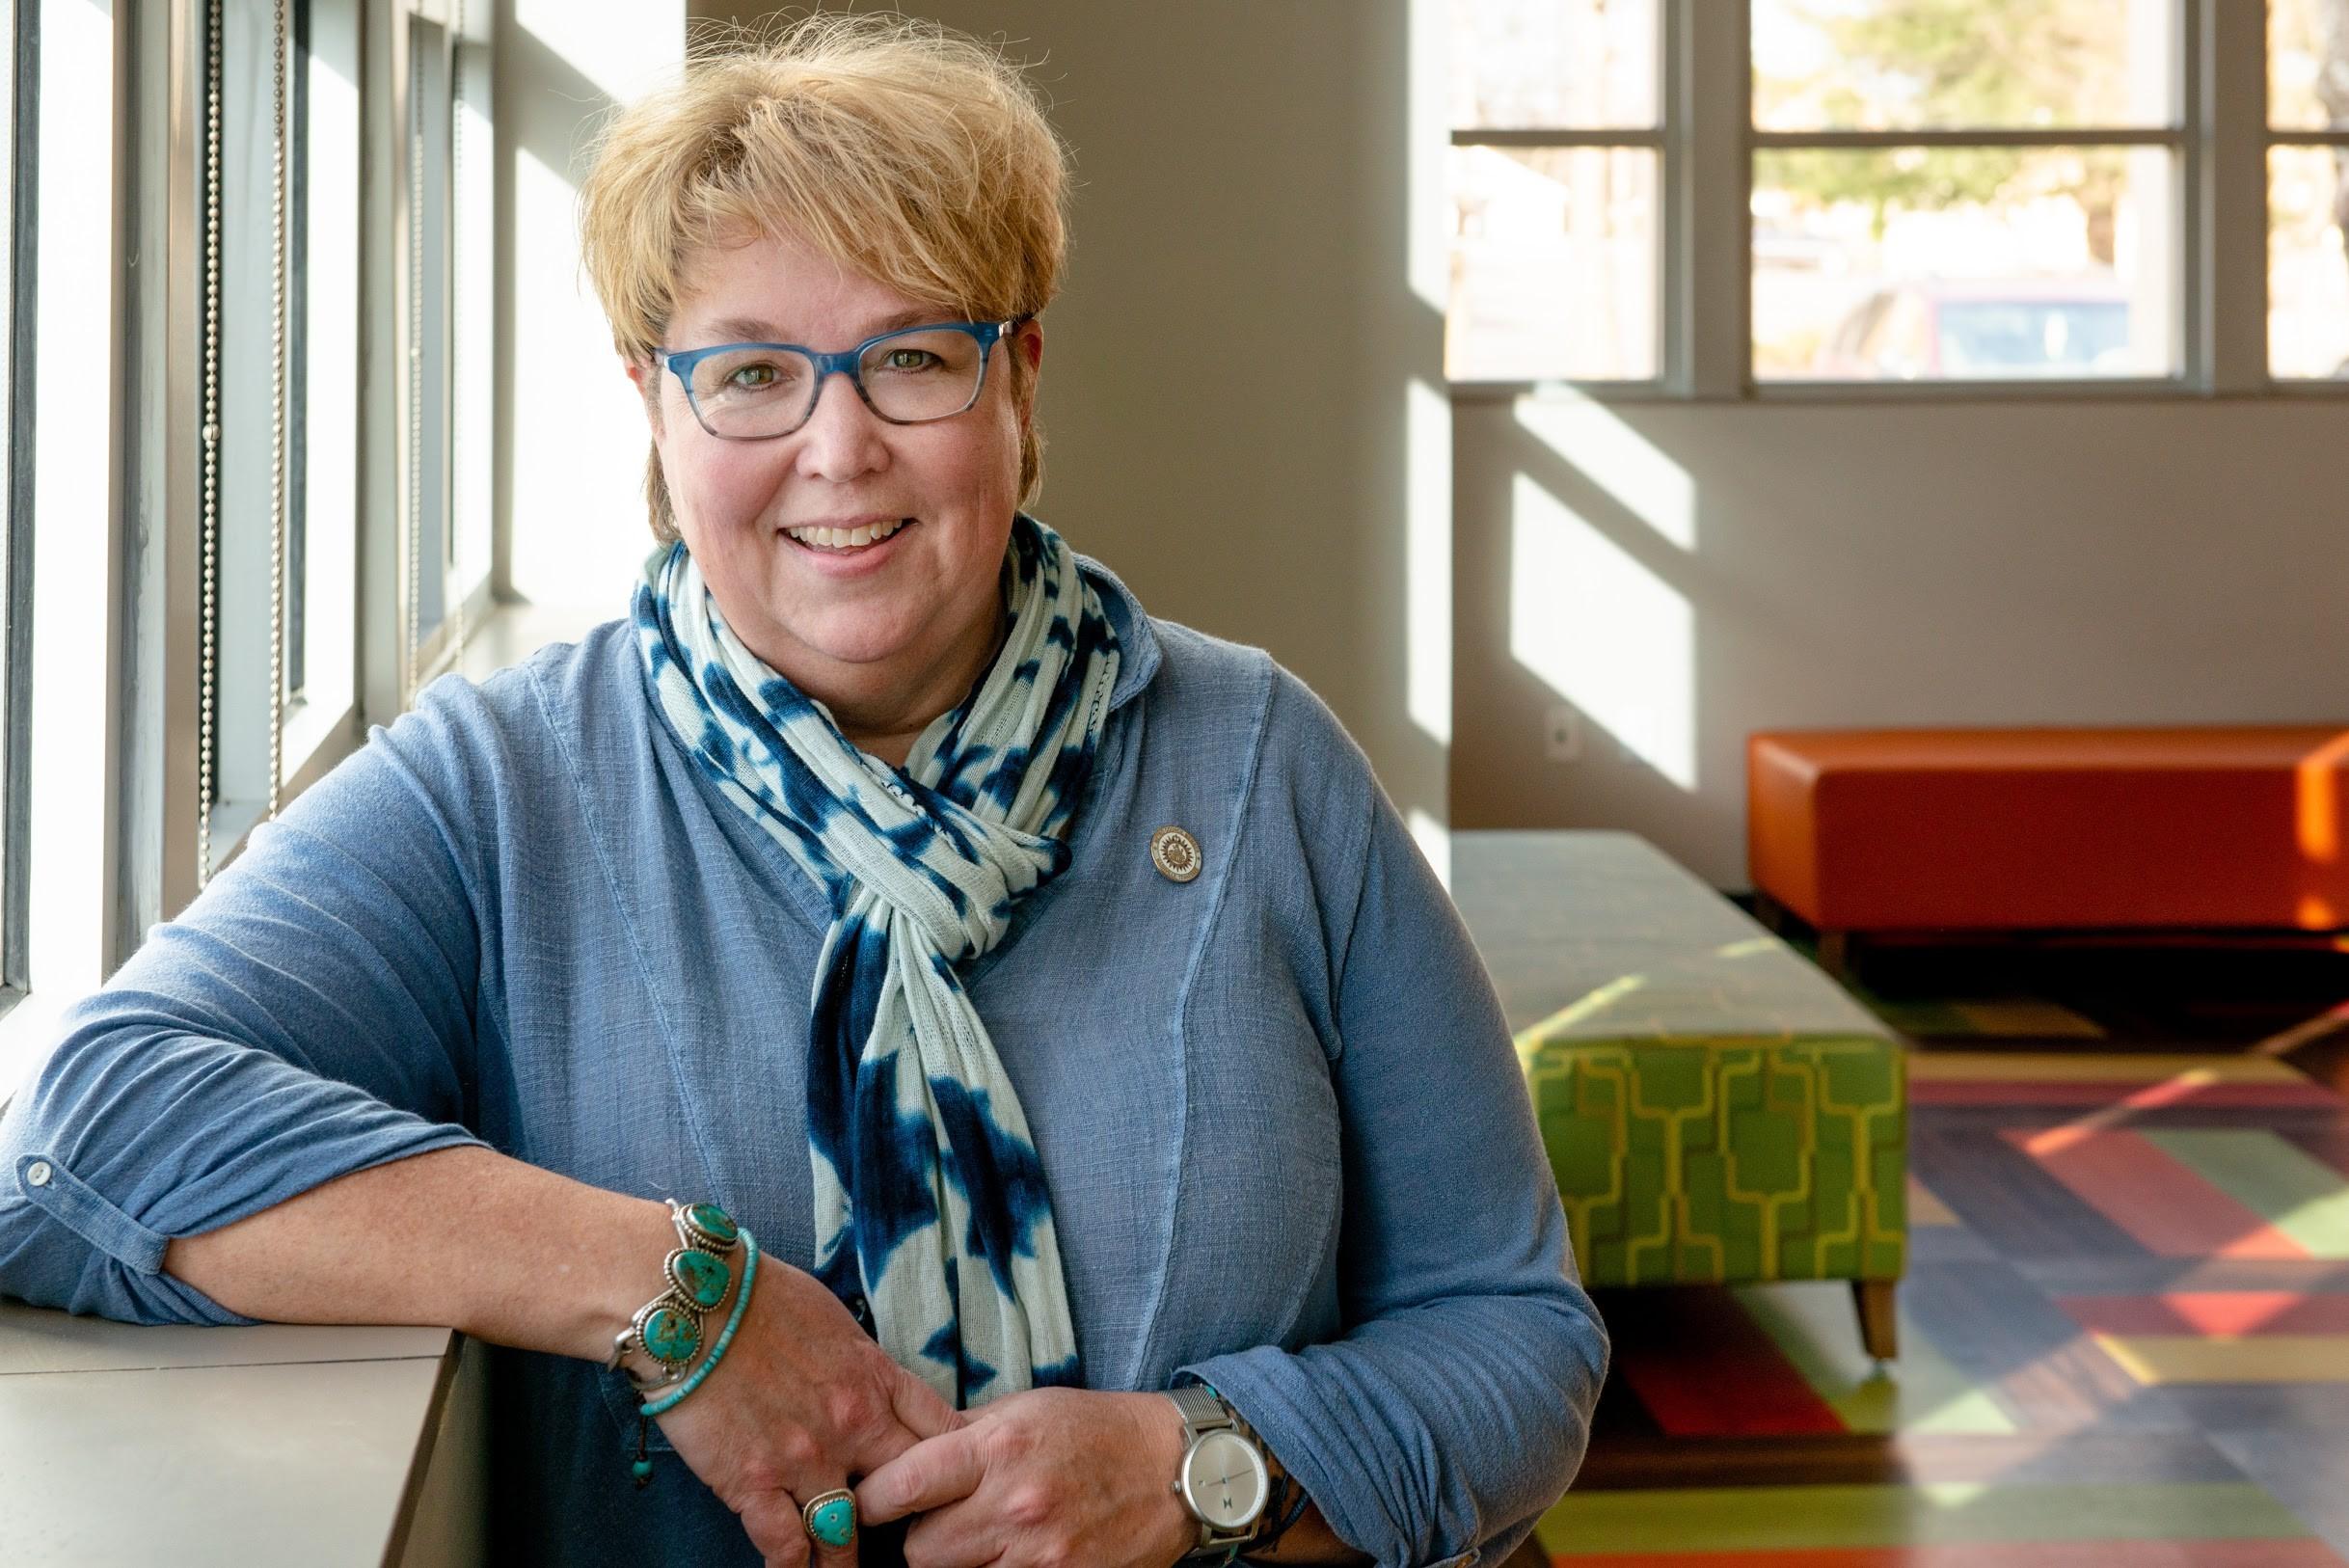 Nashville-Davidson County Metro Council Member Nancy VanReece